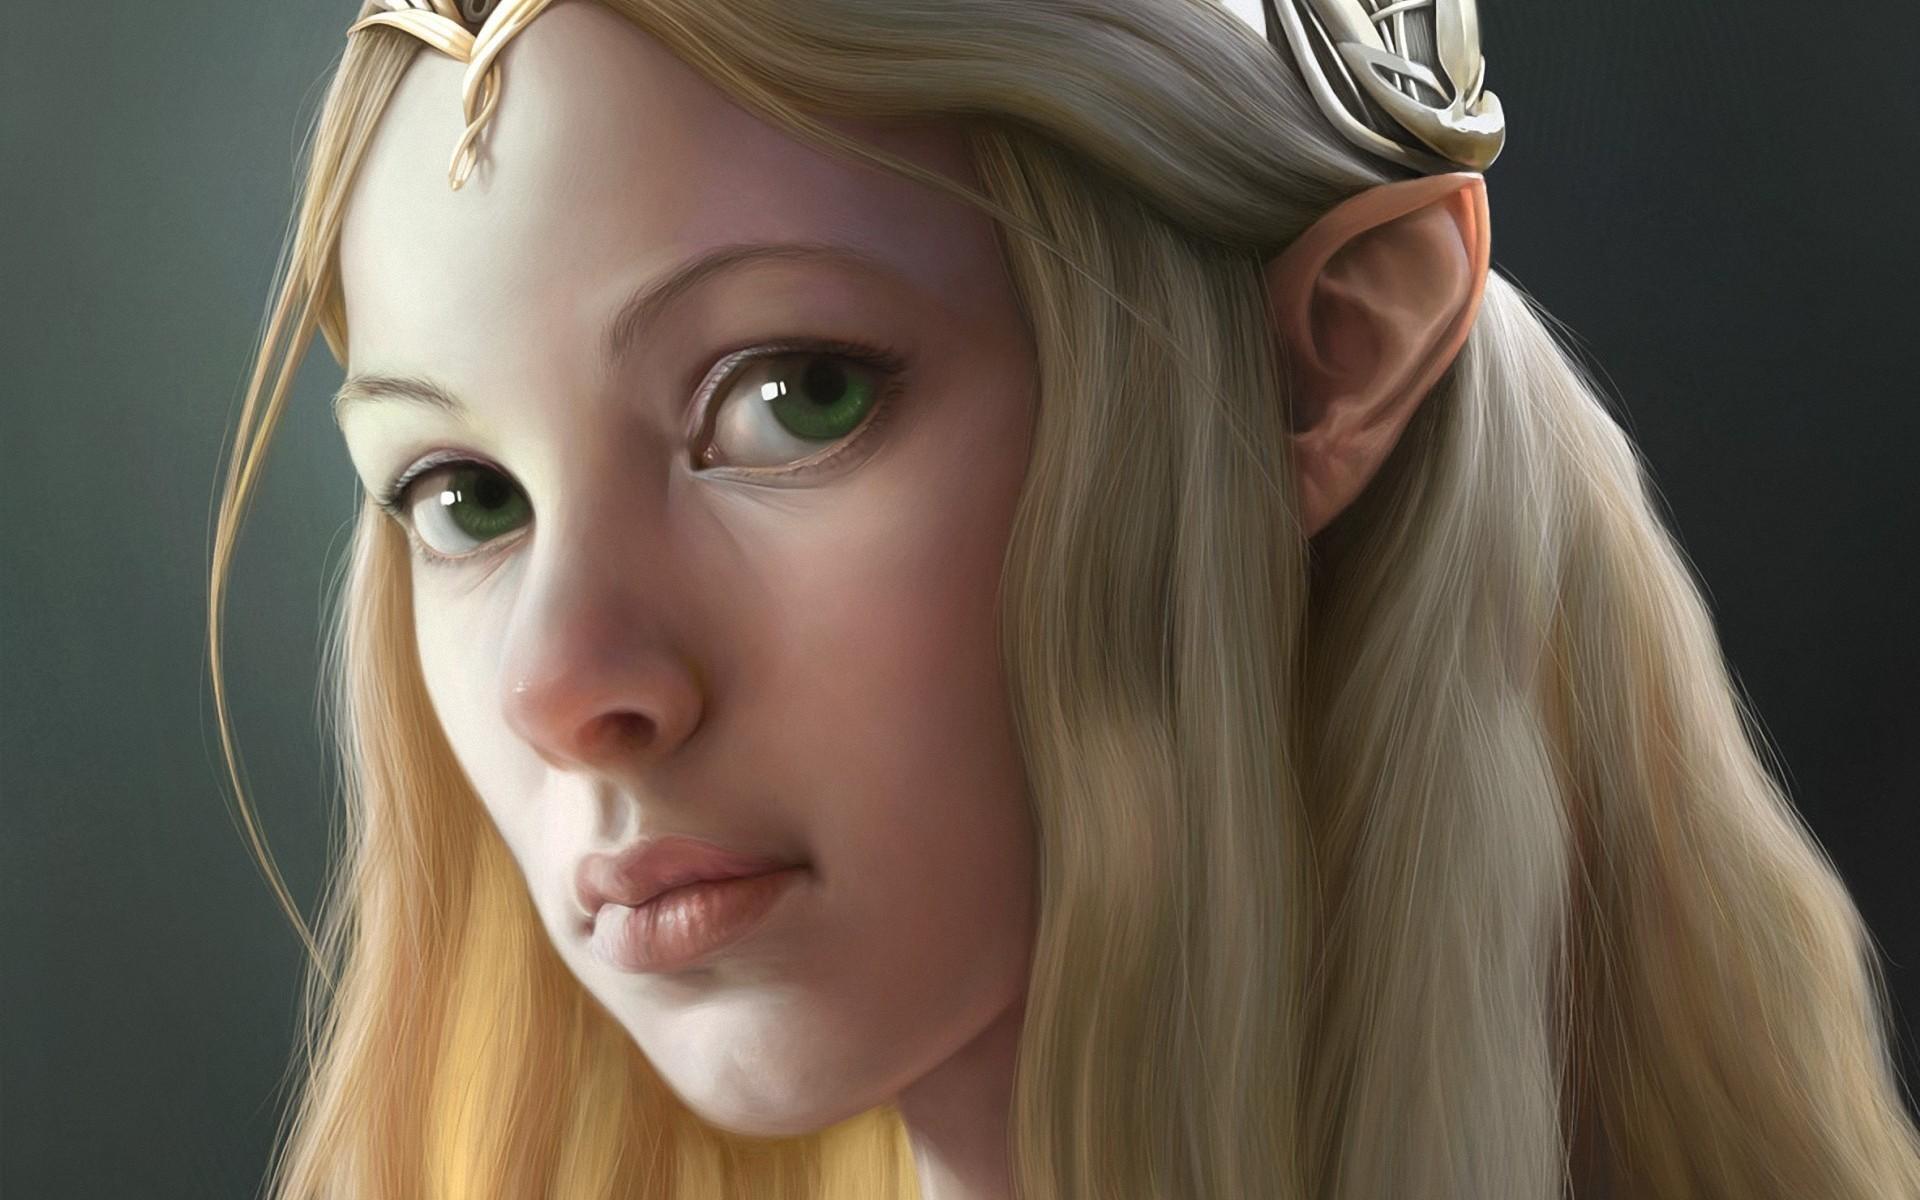 Elf girls nudes pictures